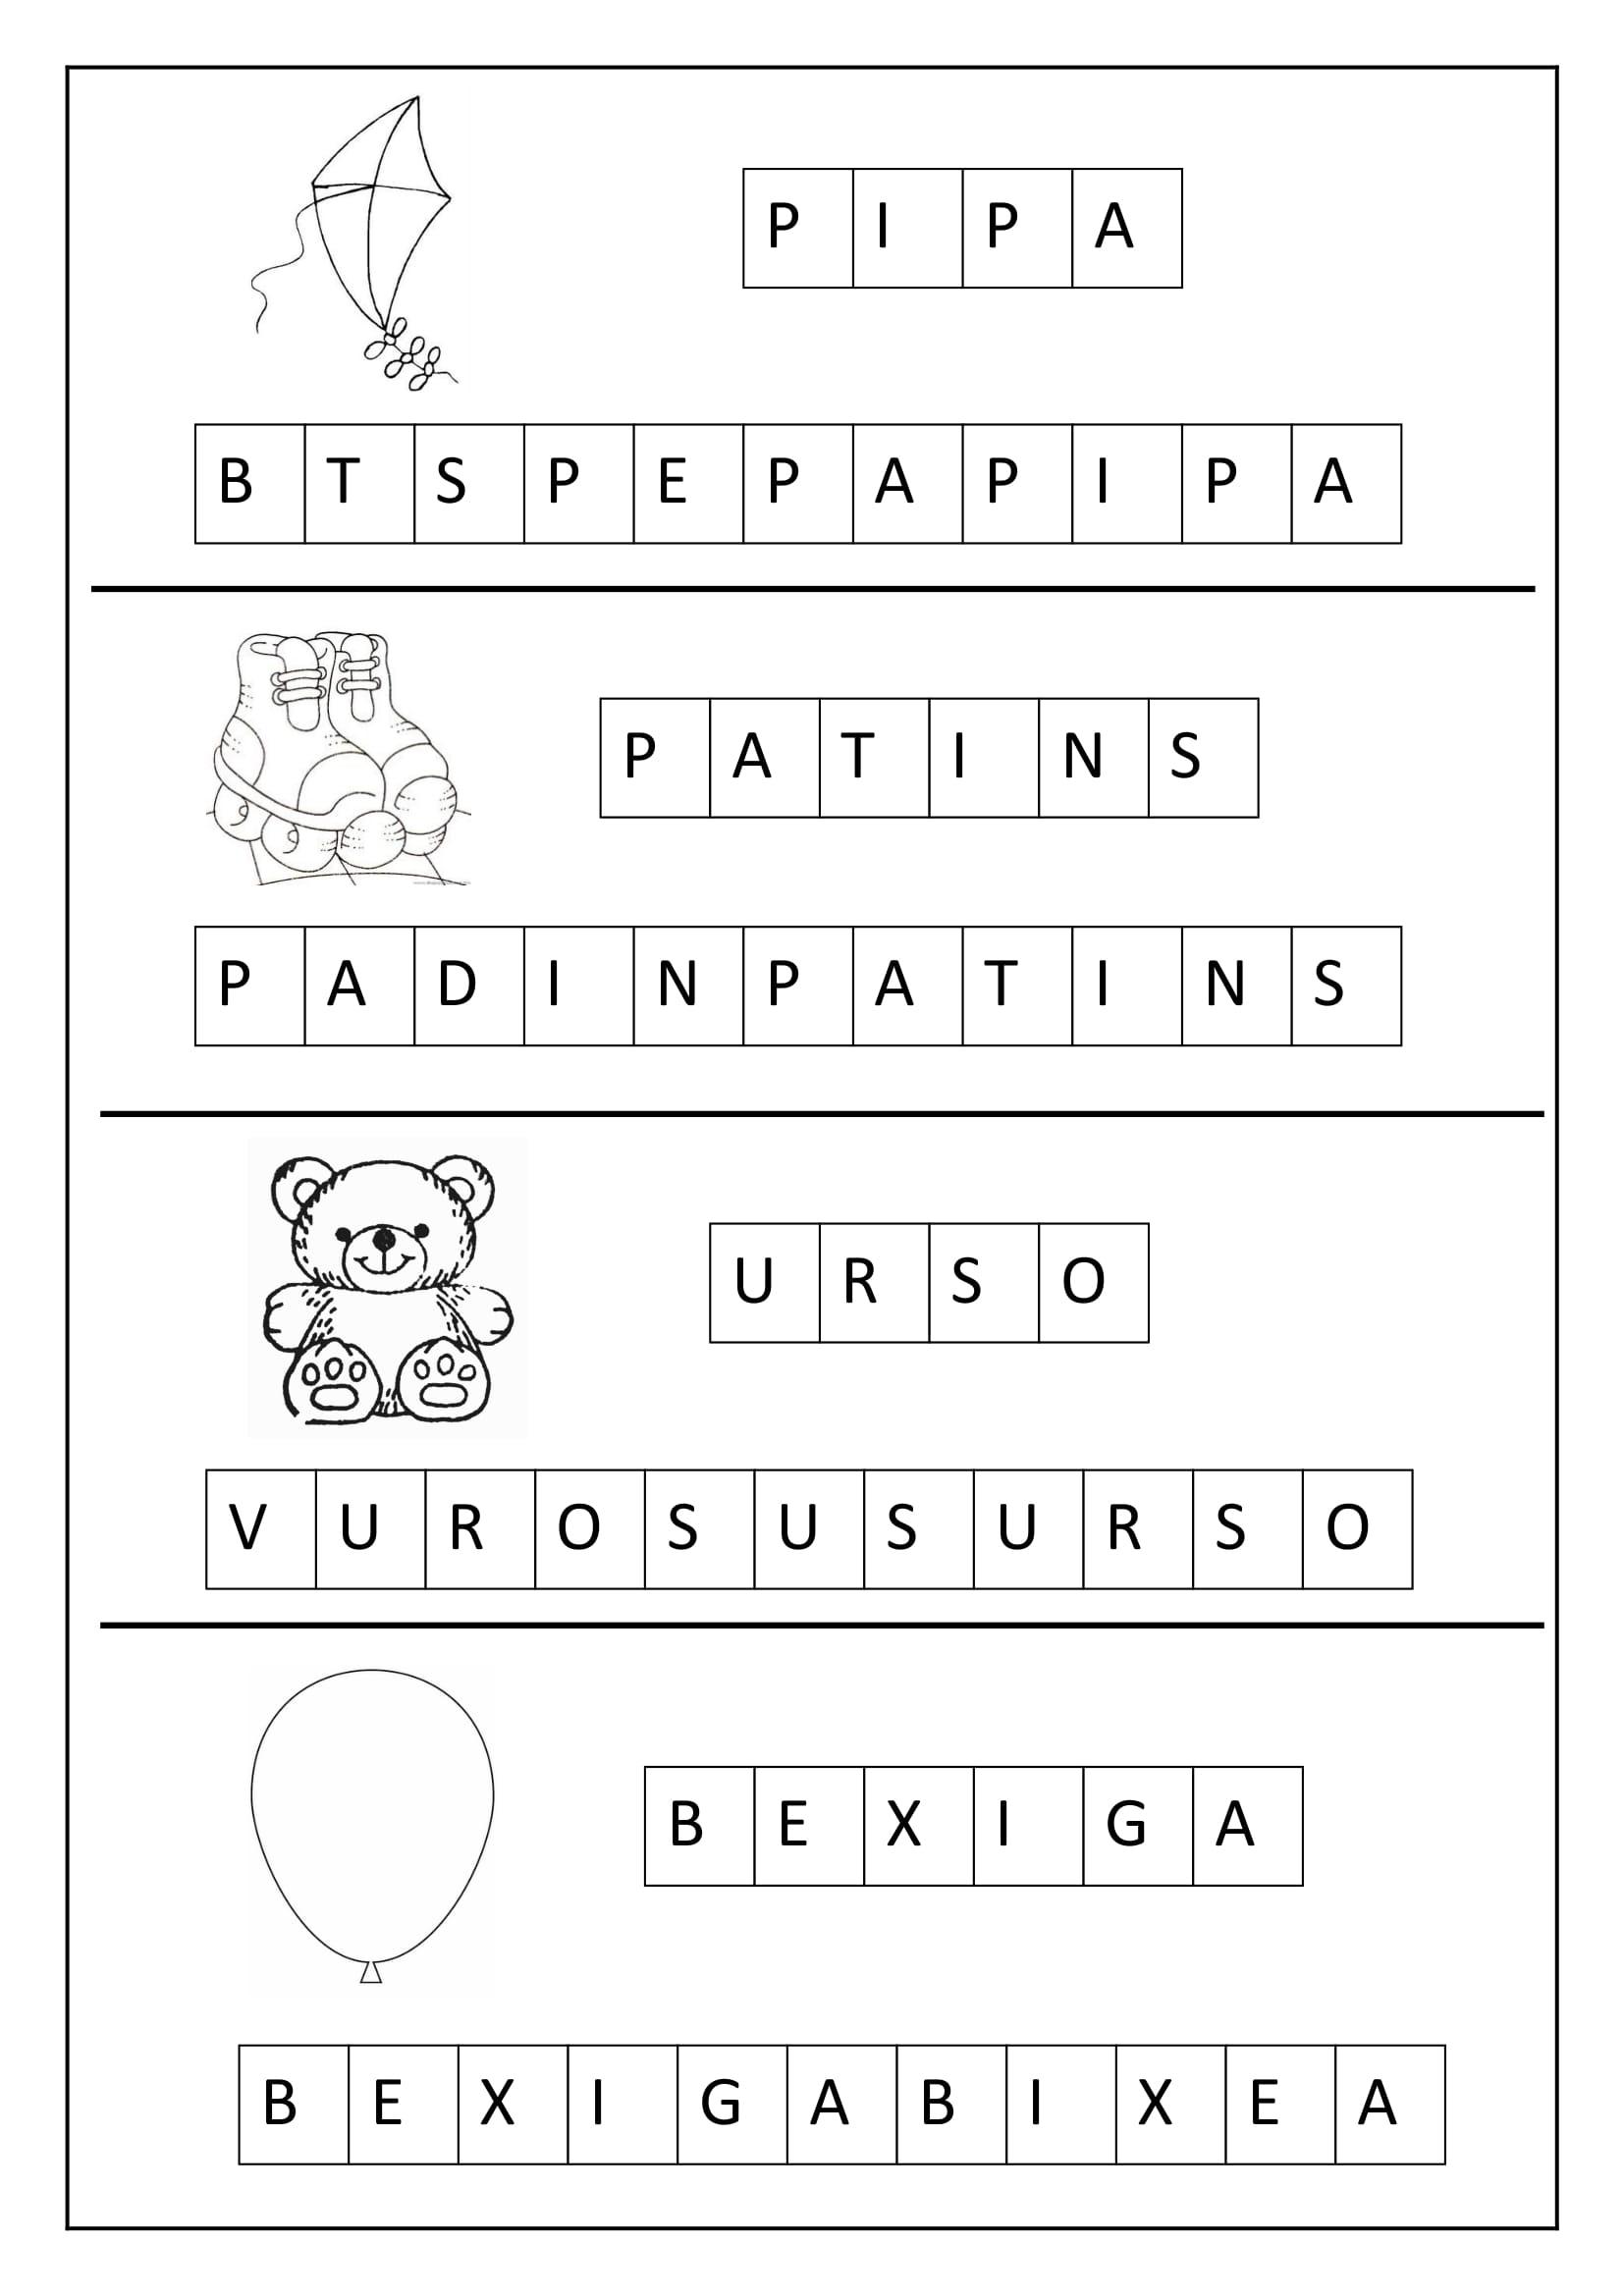 Imprimir_atividades_para_pre_silabicos-10